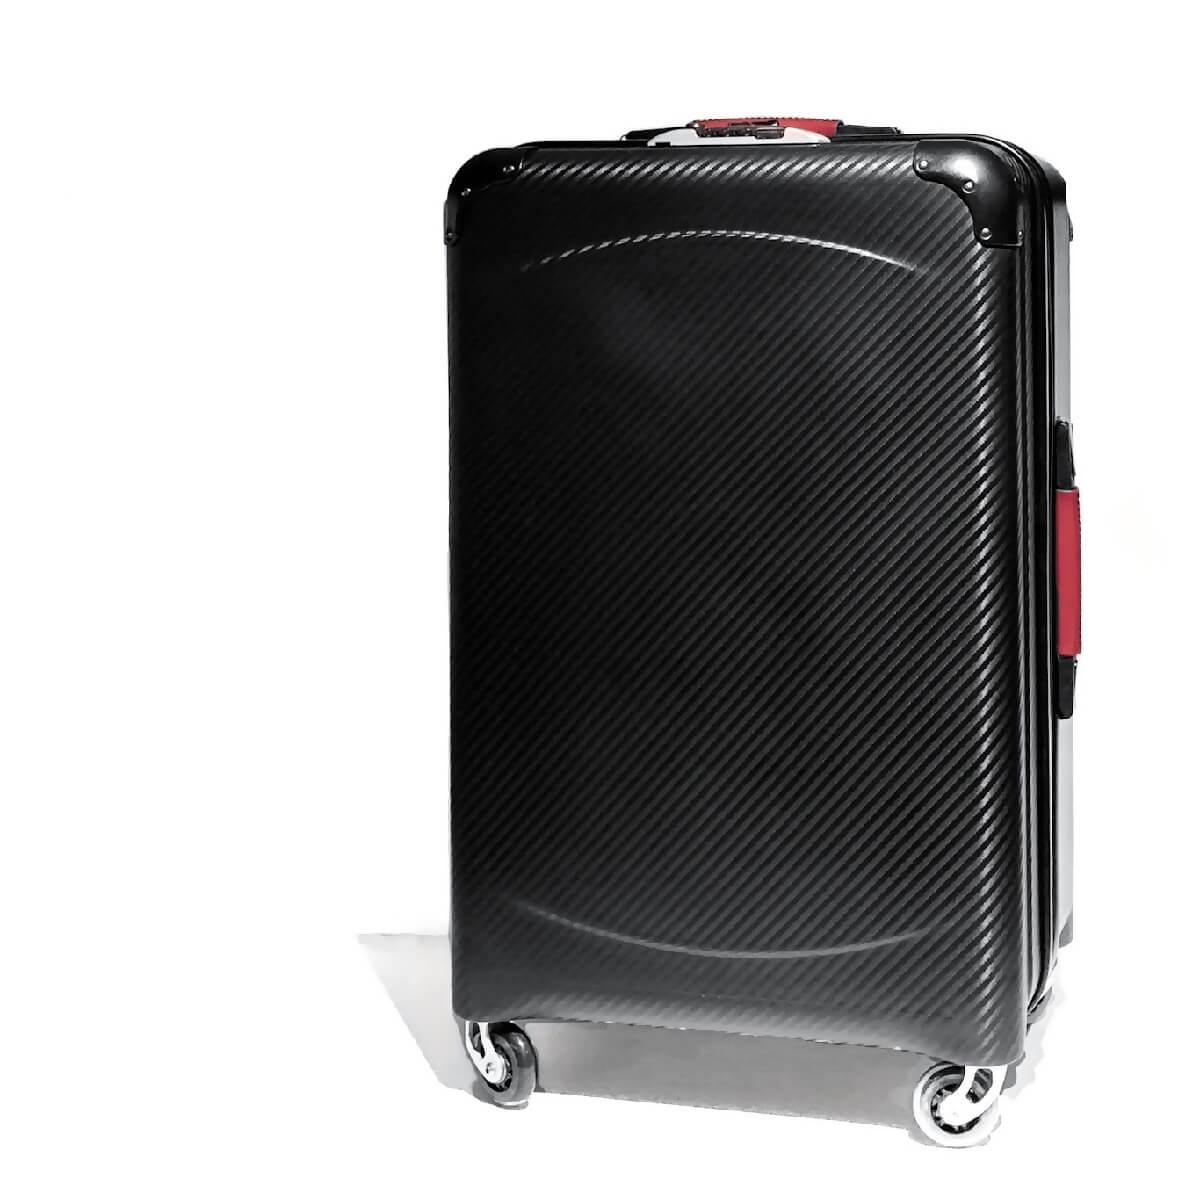 TecknoMonster (テクノモンスター)キャリーバッグ スーツケース ブランド メンズ レディース ソフトカーボンファイバー イタリア製 高級 ラグジュアリー